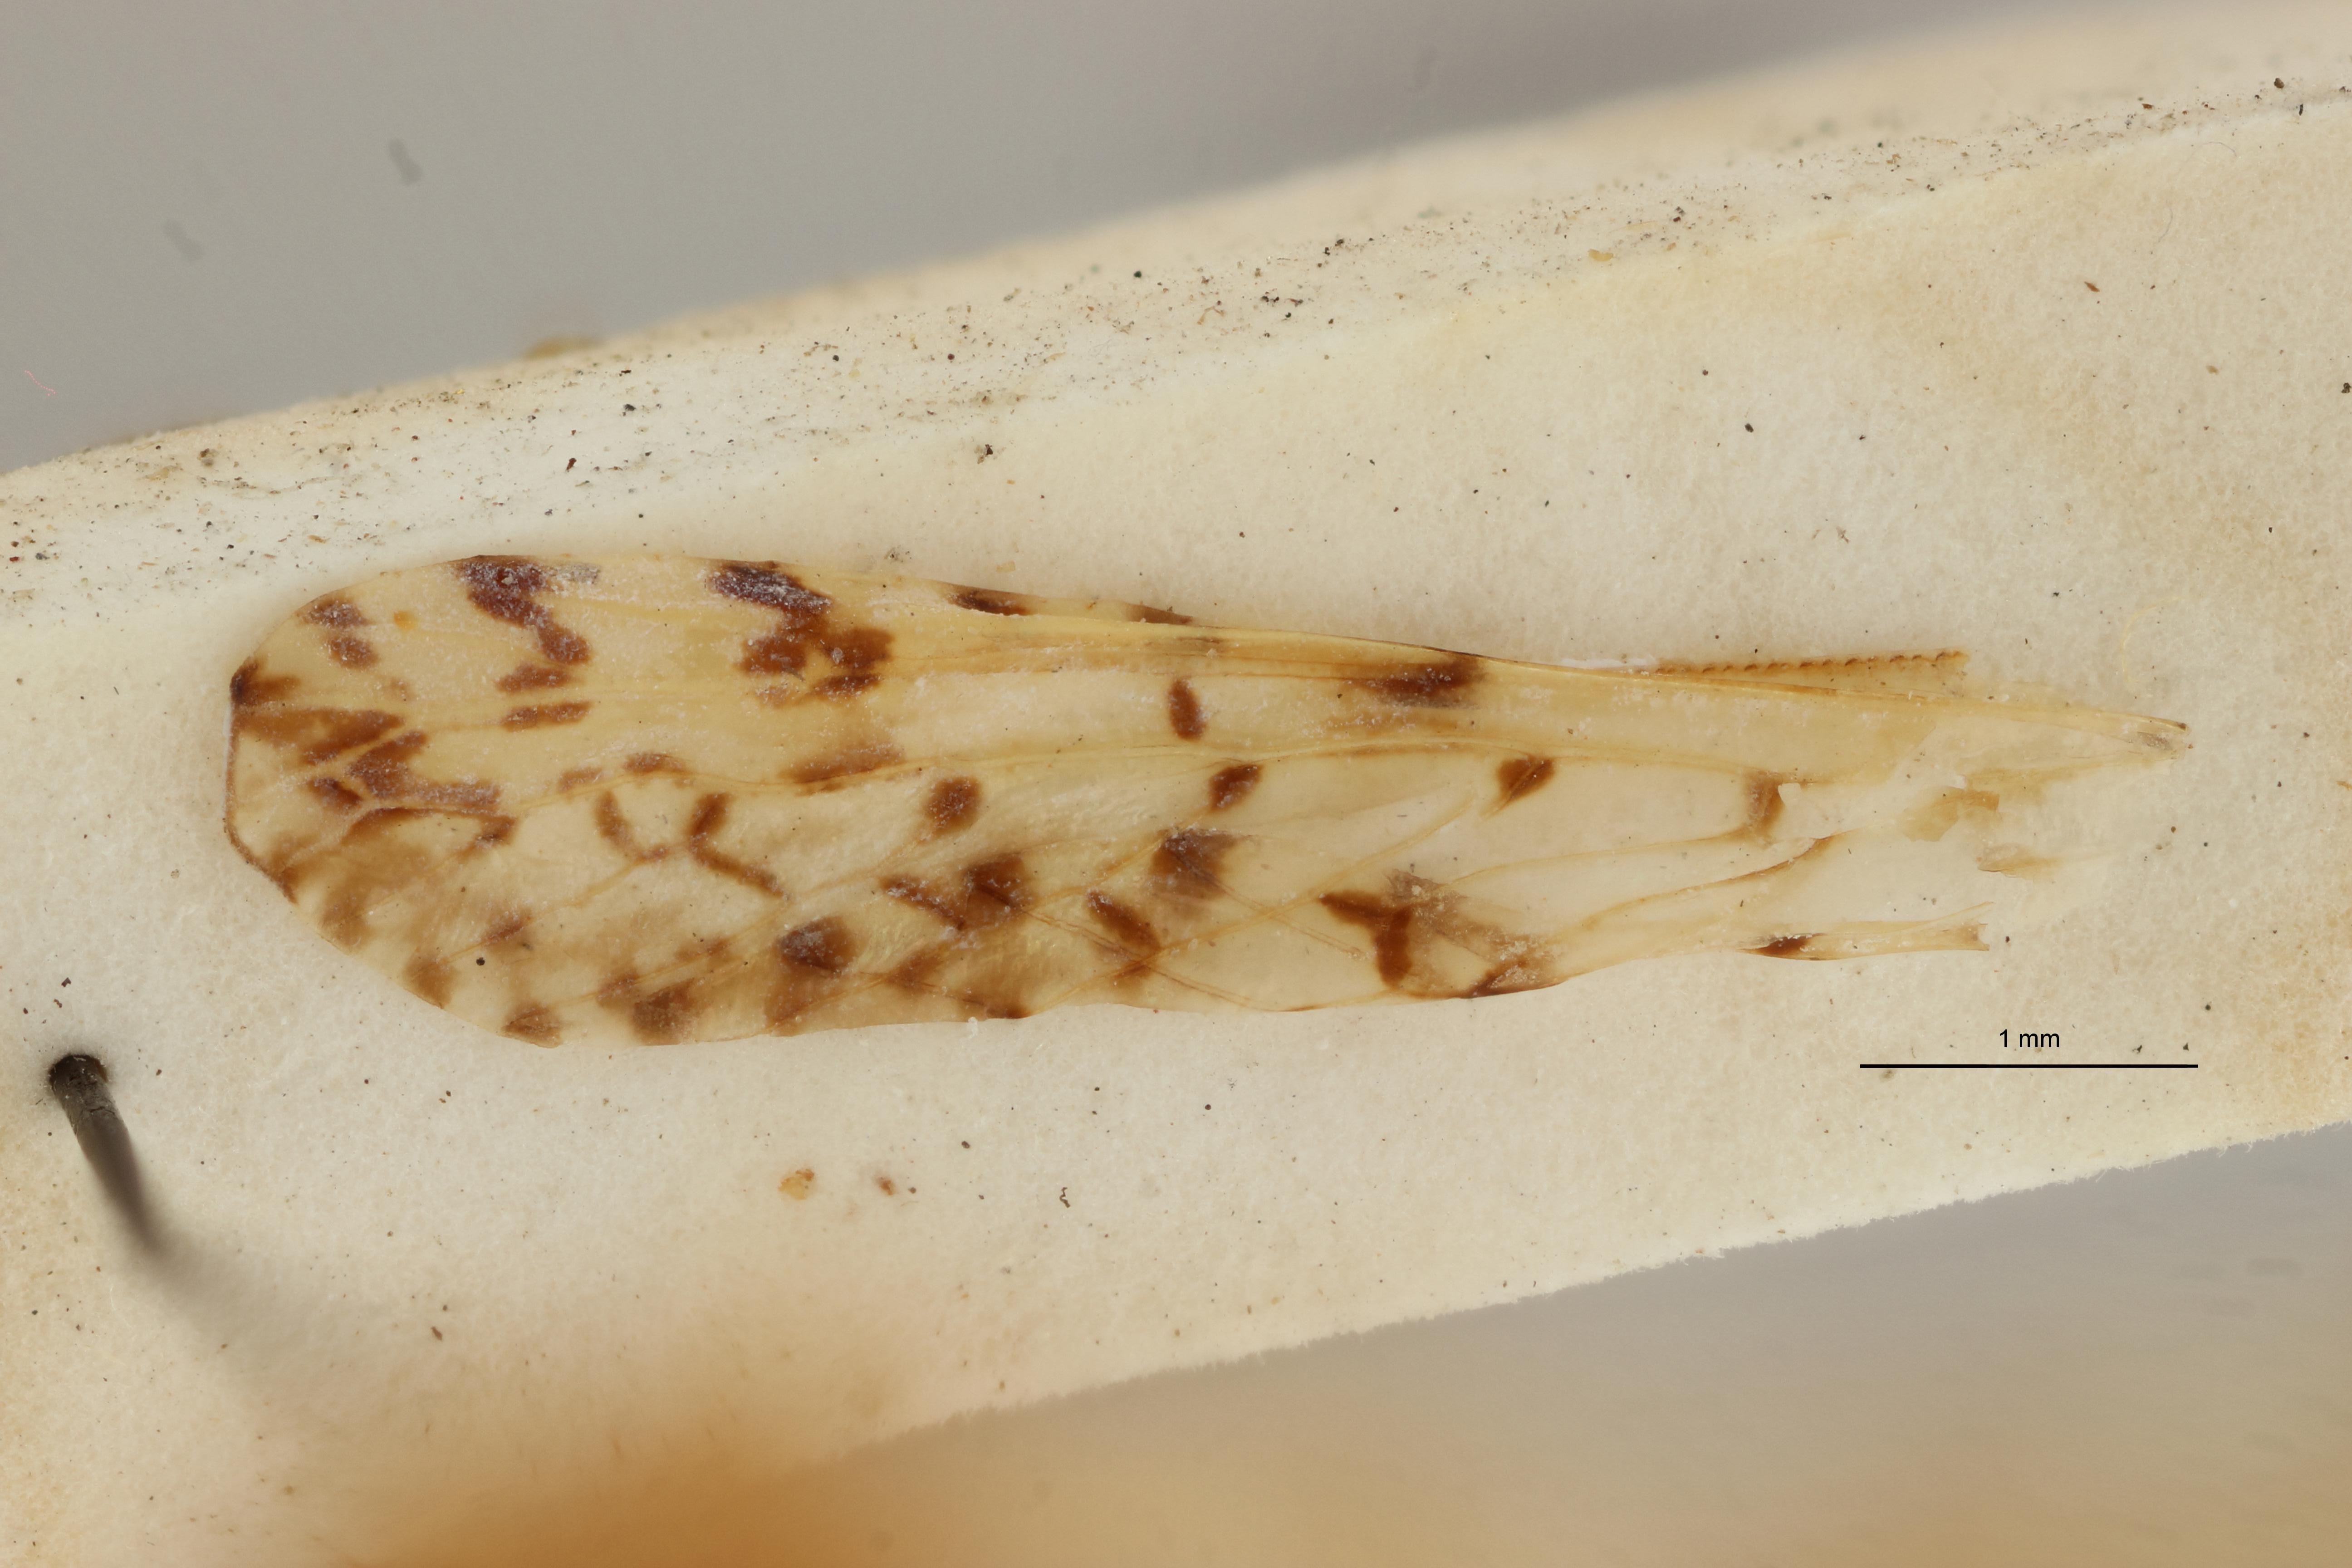 Zorabana maculata pt W ZS PMax Scaled.jpeg